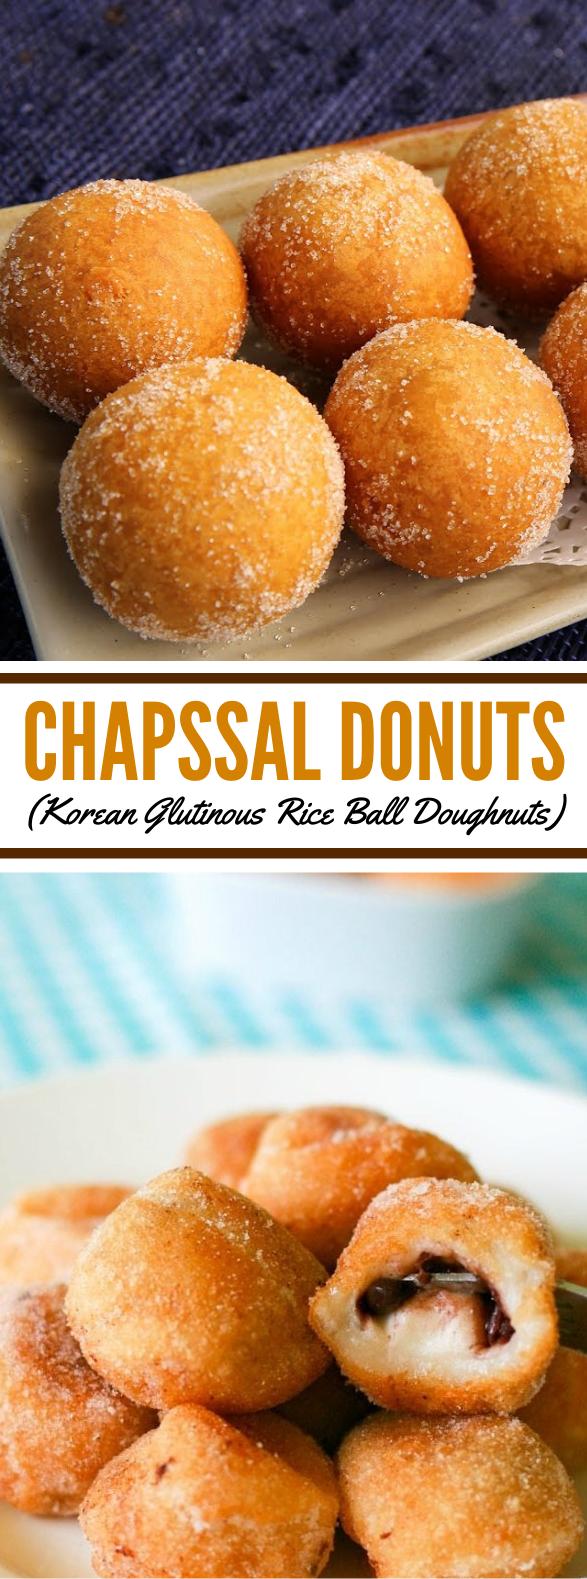 CHAPSSAL DONUTS (KOREAN GLUTINOUS RICE BALL DOUGHNUTS) #desserts #cake